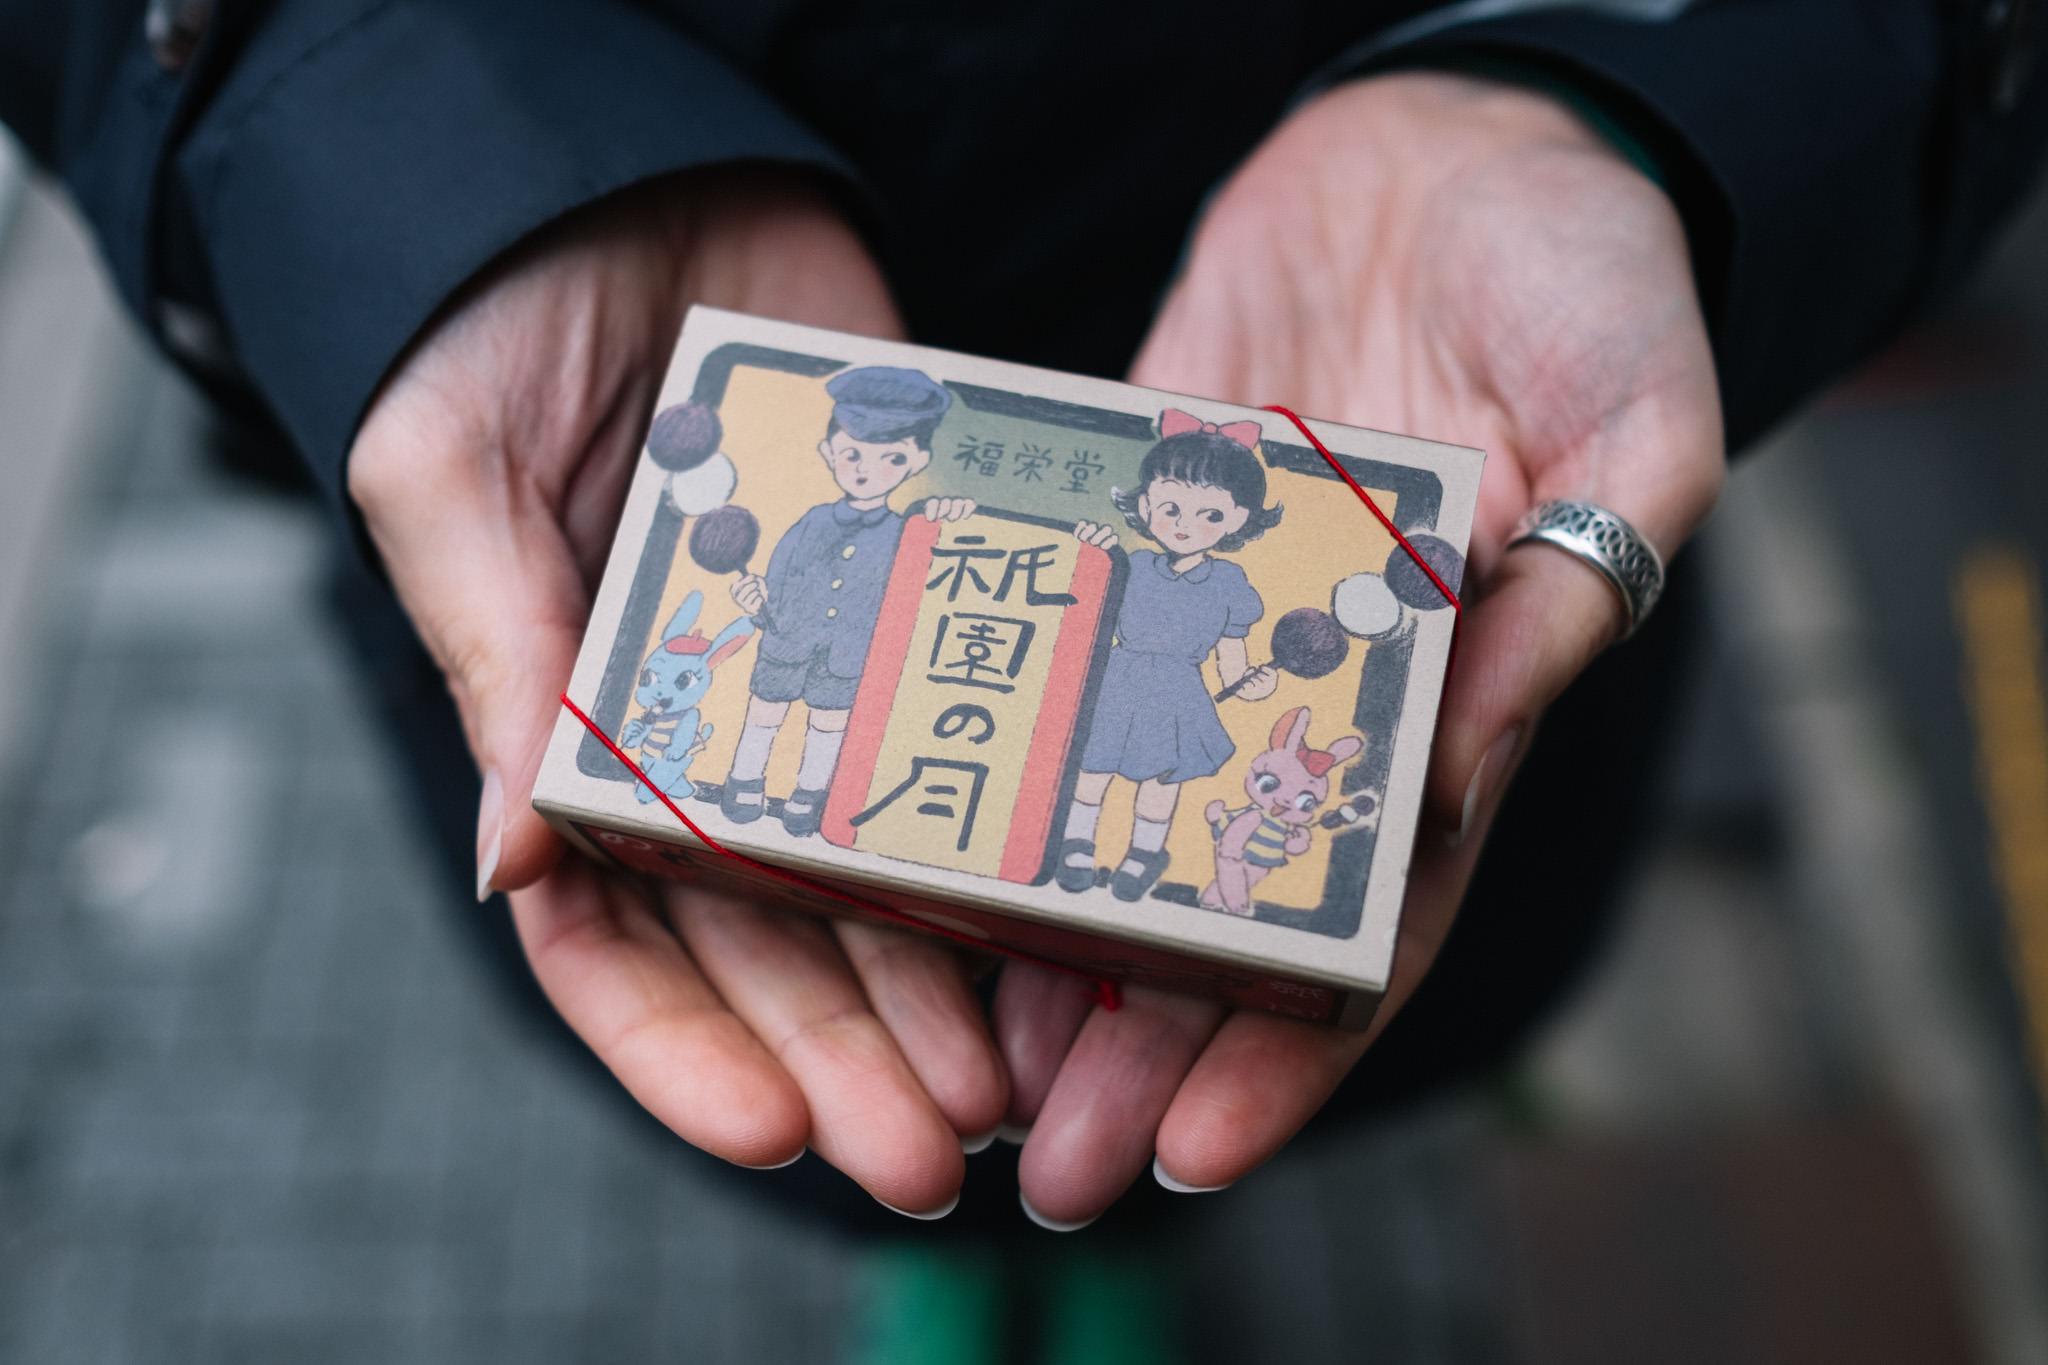 chris_eberhardt_japan_travel_reise_nippon-54.jpg